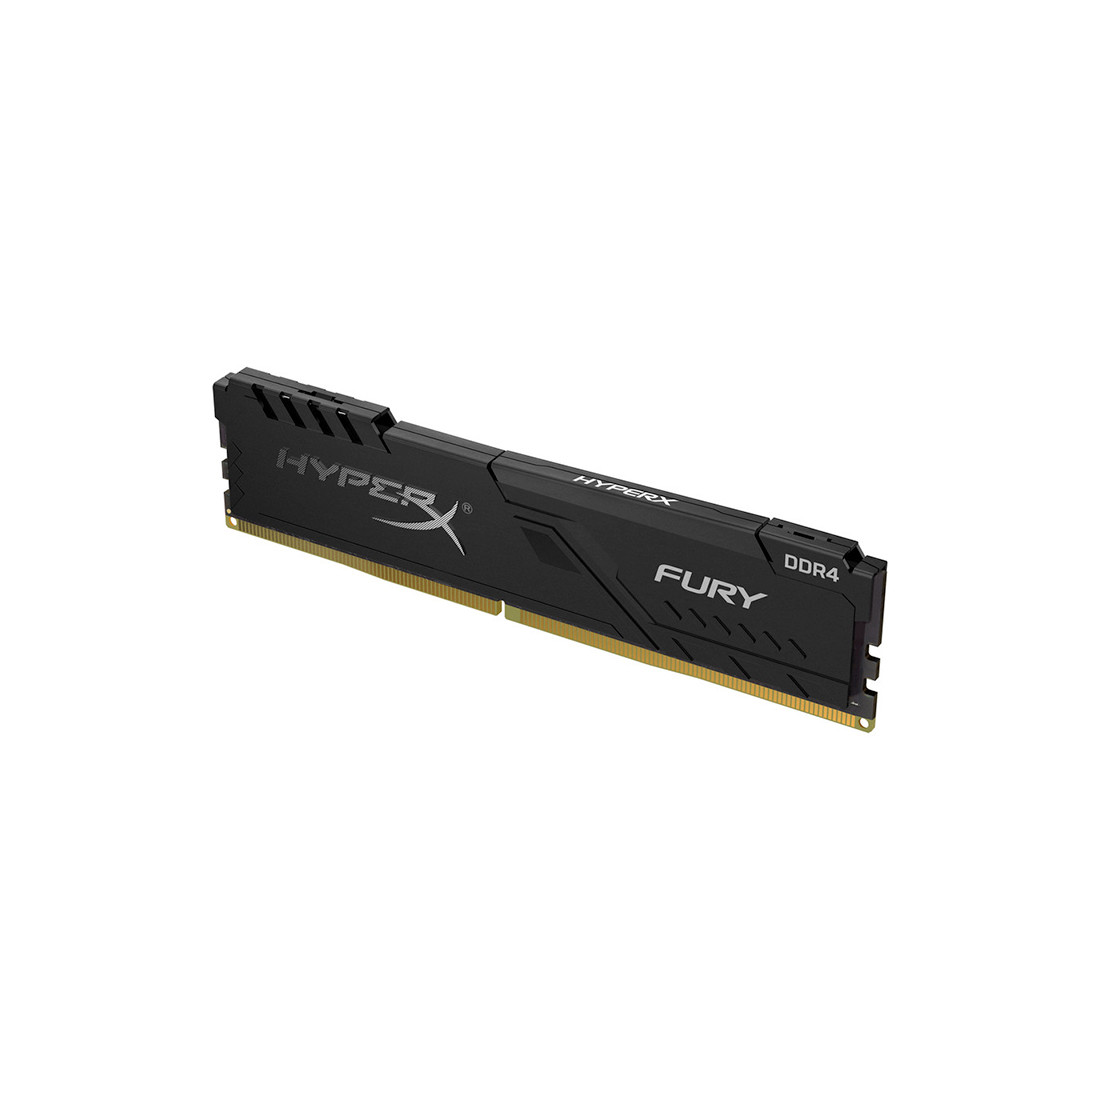 Модуль памяти Kingston HyperX Fury HX432C16FB3/8 DDR4 8G 3200MHz